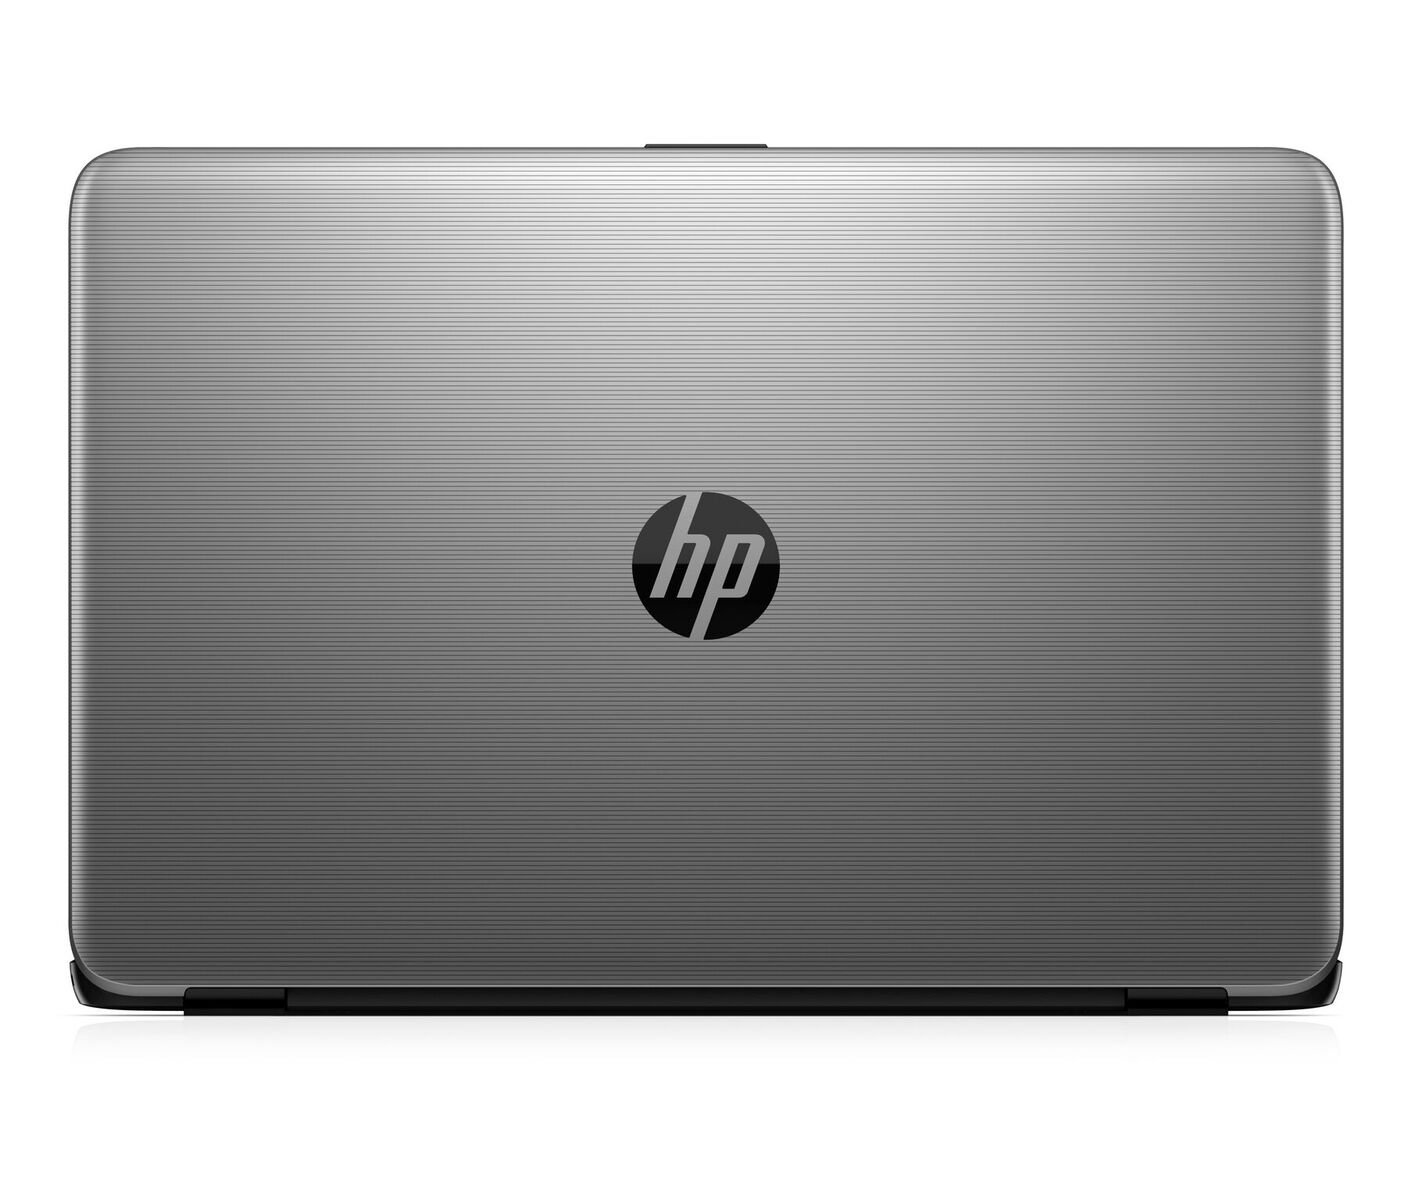 hp laptop 17 x101na 17 3 inch display intel core i5 7200u 8gb ram 1tb hdd ebay. Black Bedroom Furniture Sets. Home Design Ideas